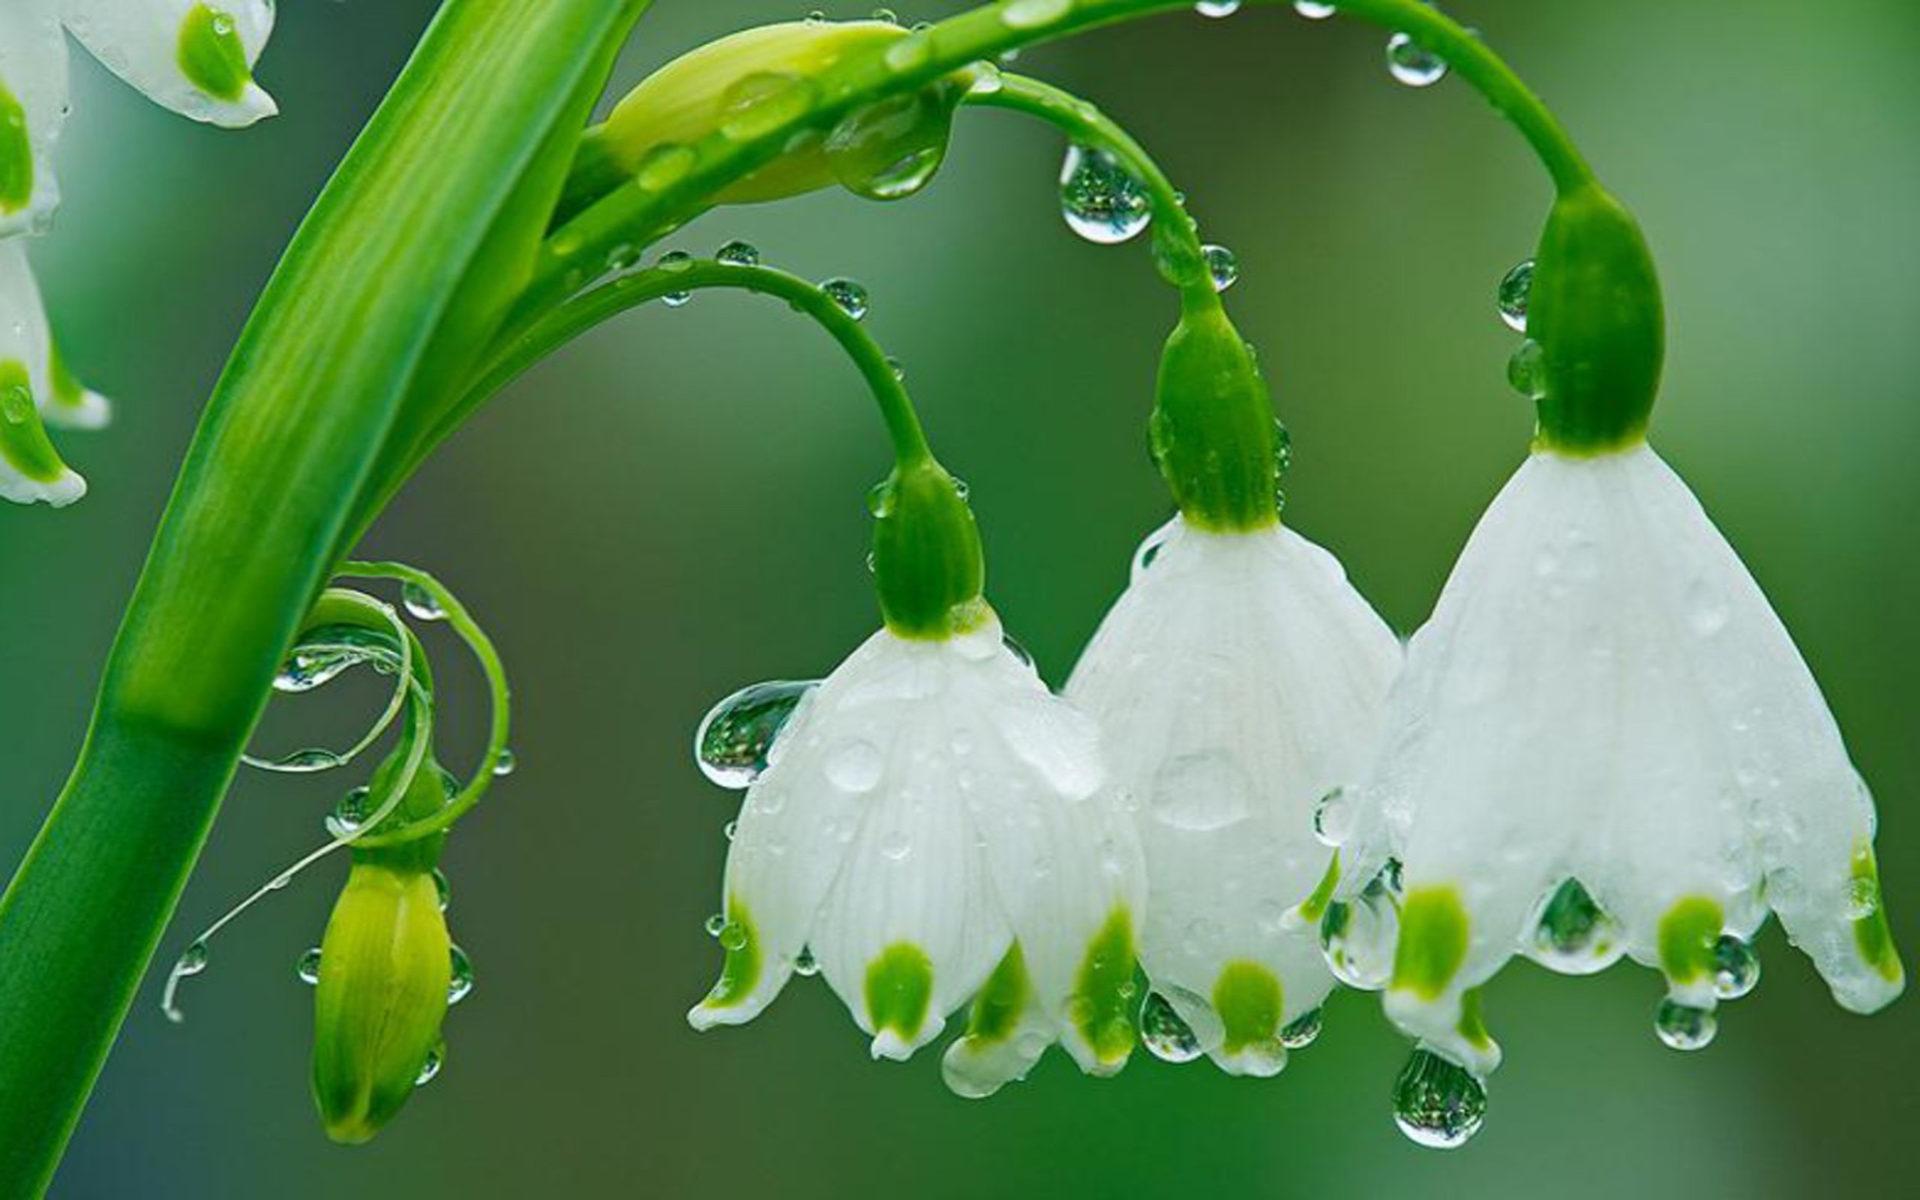 Paint Falling Wallpaper Spring Flowers Drops Of Rain Hd Wallpaper Wallpapers13 Com